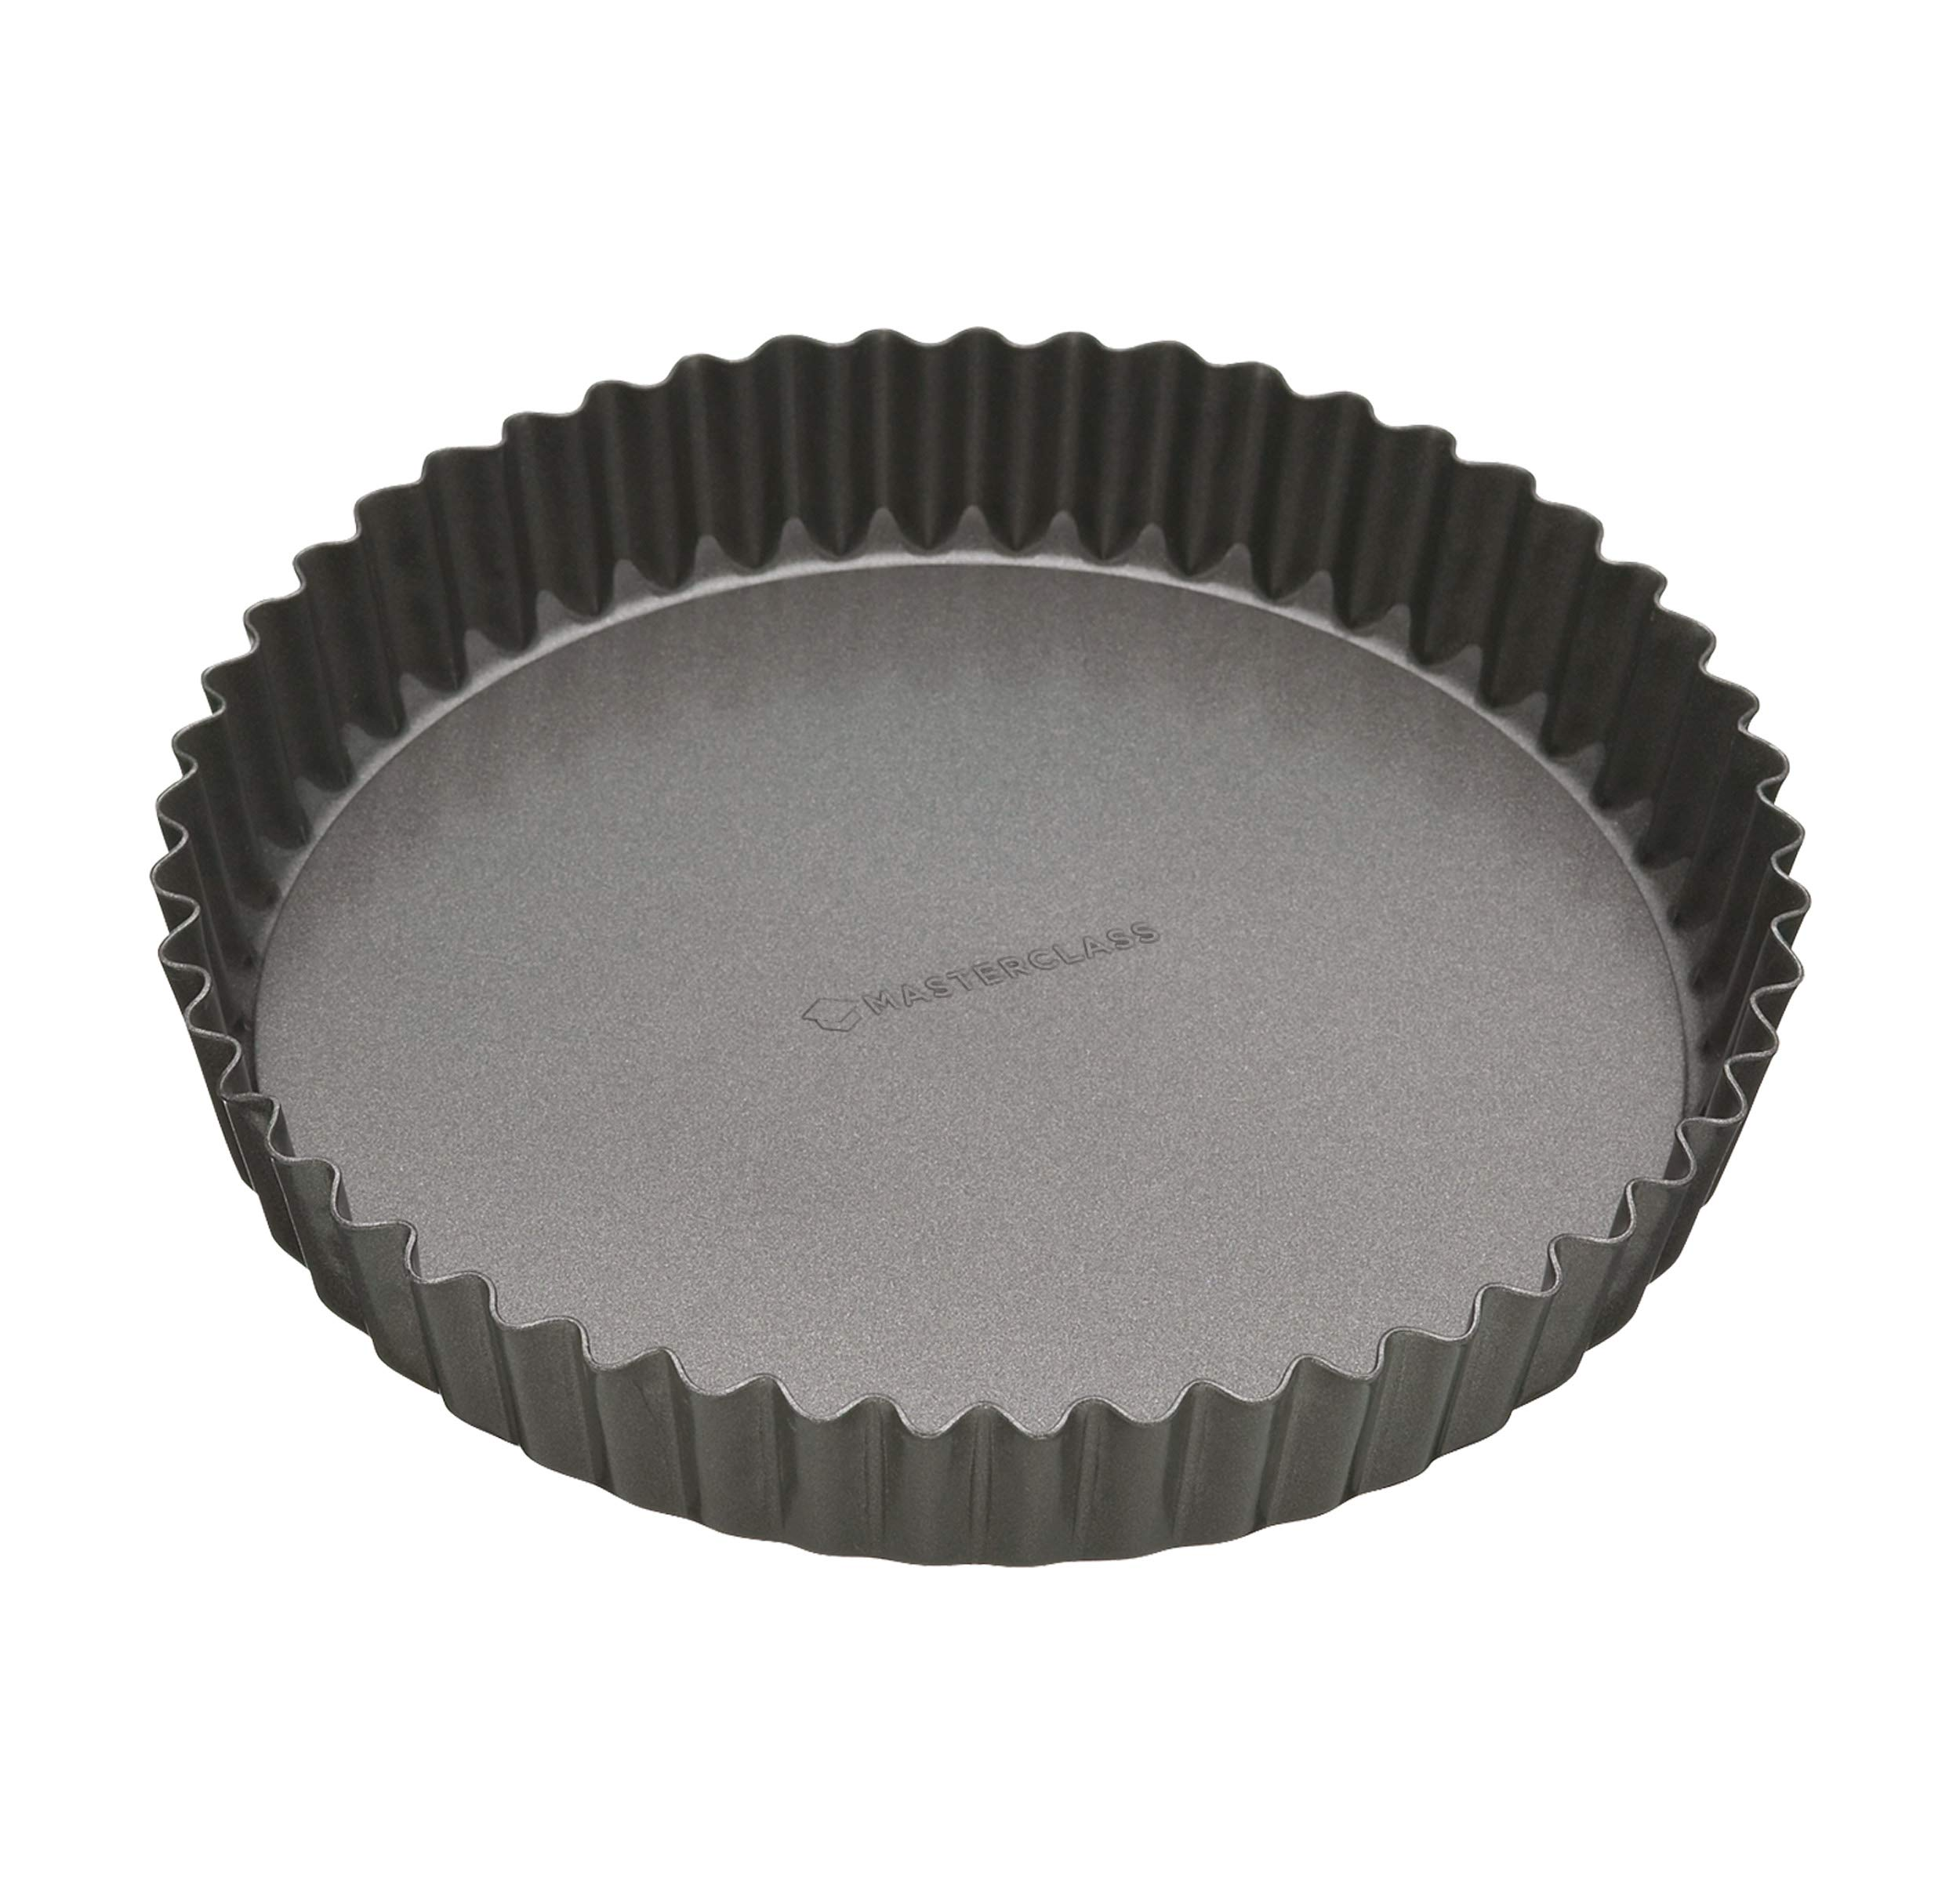 Kitchen Craft Molde Quiche Redondo Base Suelta, Acero, Negro, 25.4x27.8x4.2 cm product image